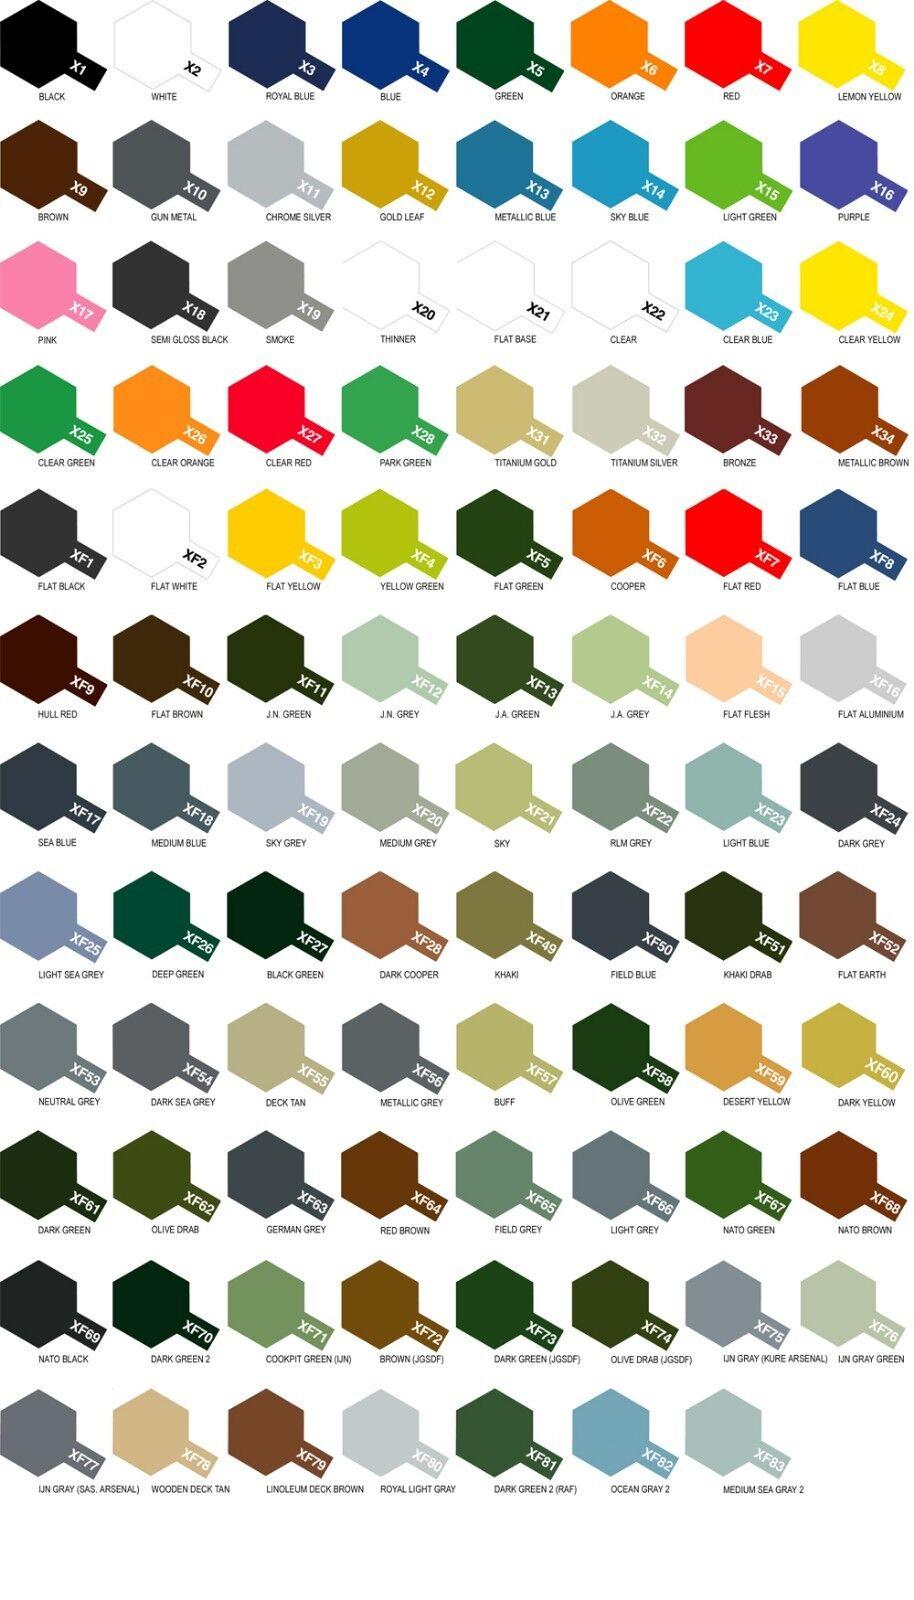 6 Dosen Acrylfarbe Tamiya Serie X- X- X- XF (zur Auswahl der Karte farbig)  | Auktion  b533eb